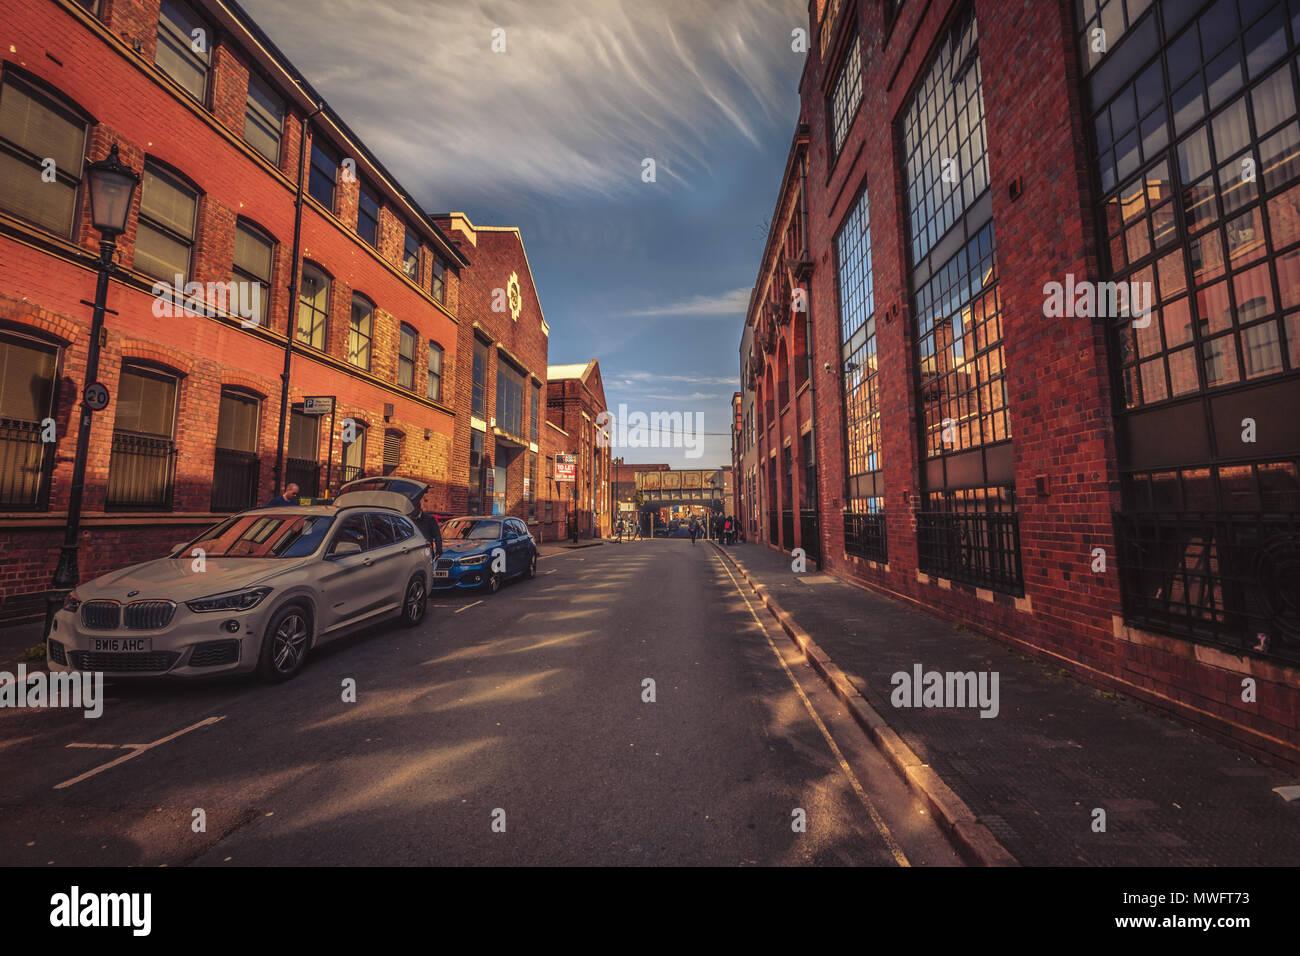 Jewellery Quarter street shot in Birmingham, UK - Stock Image